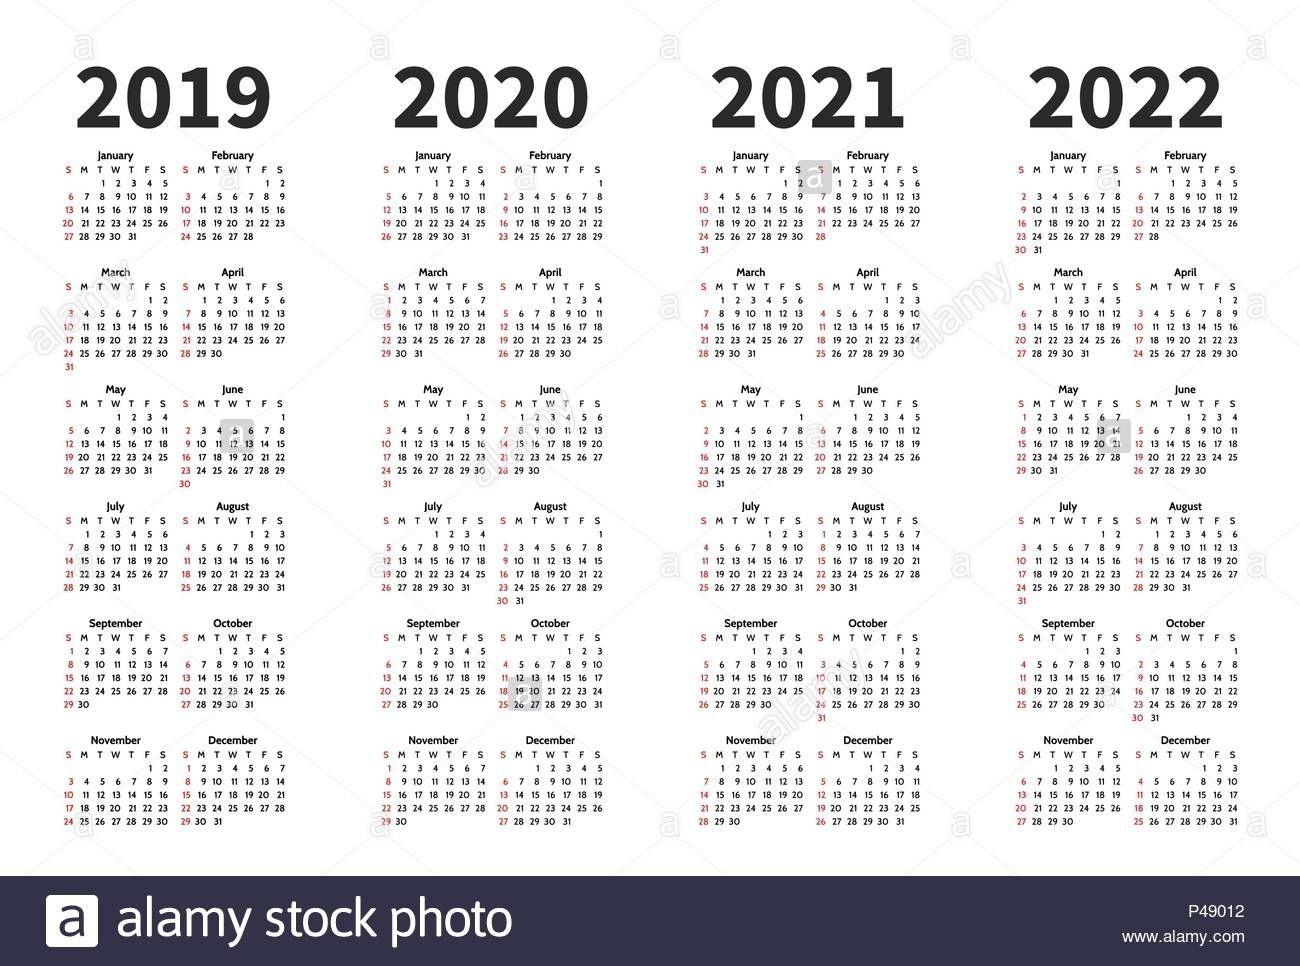 Exceptional 4 Year Calendar 2019 To 2020 In 2020 | Calendar